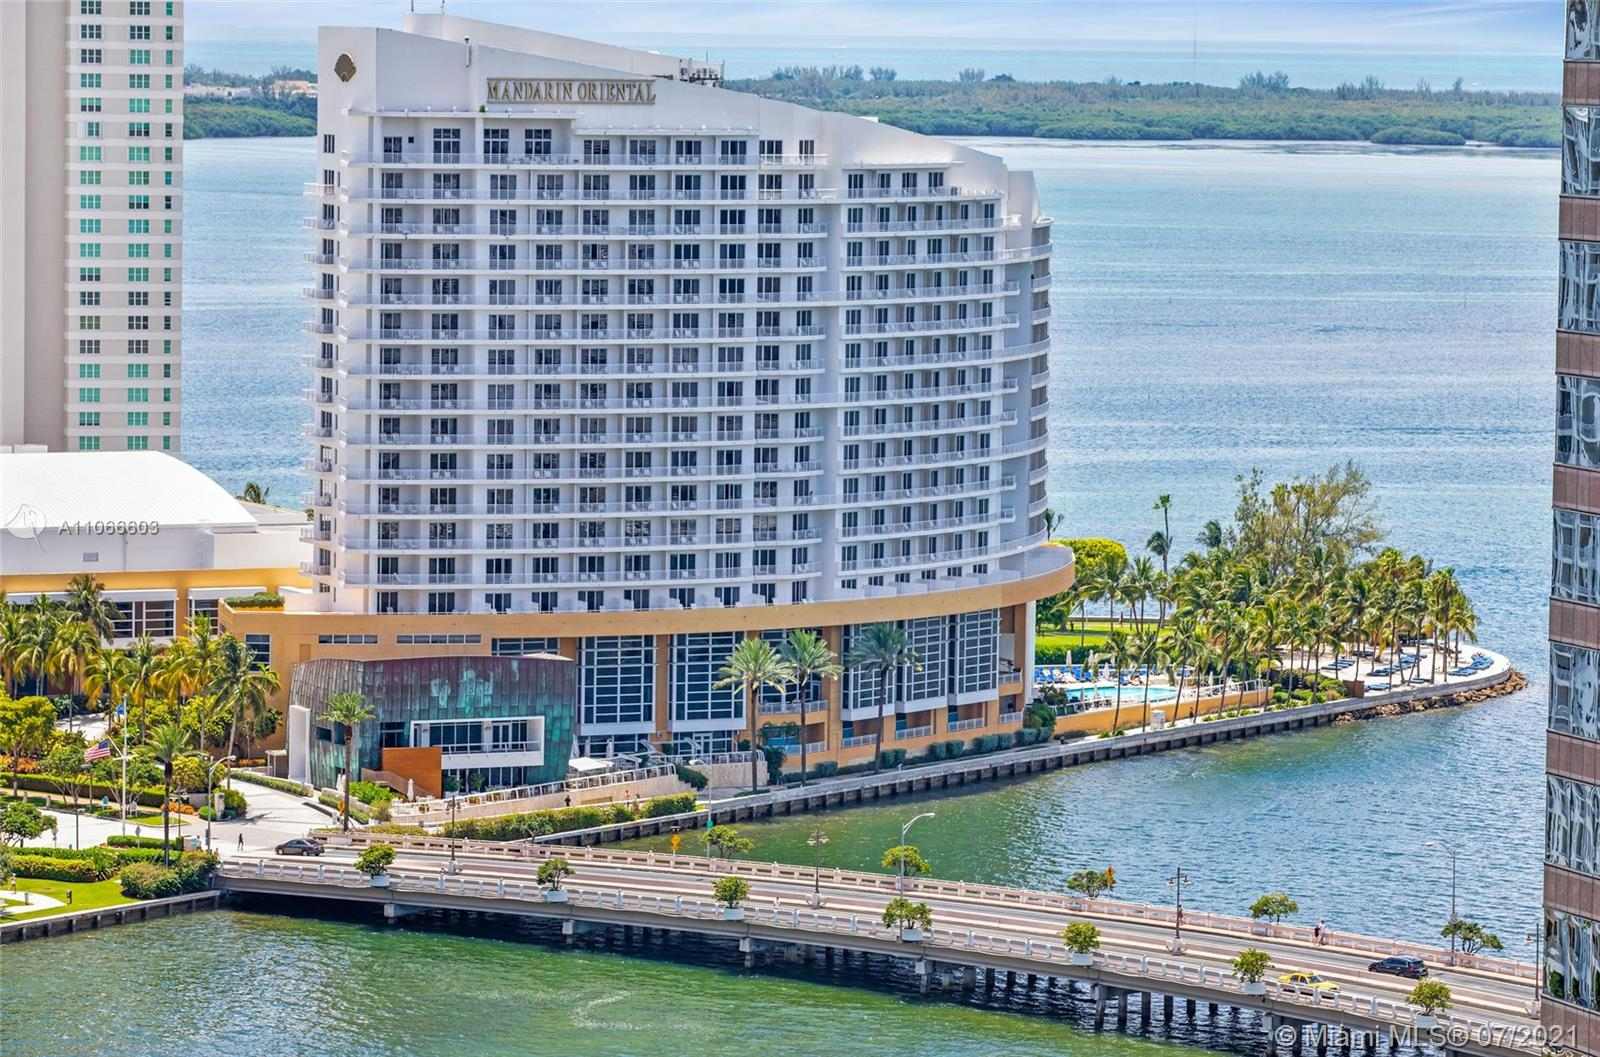 500 Brickell West Tower #2508 - 500 Brickell Ave #2508, Miami, FL 33131